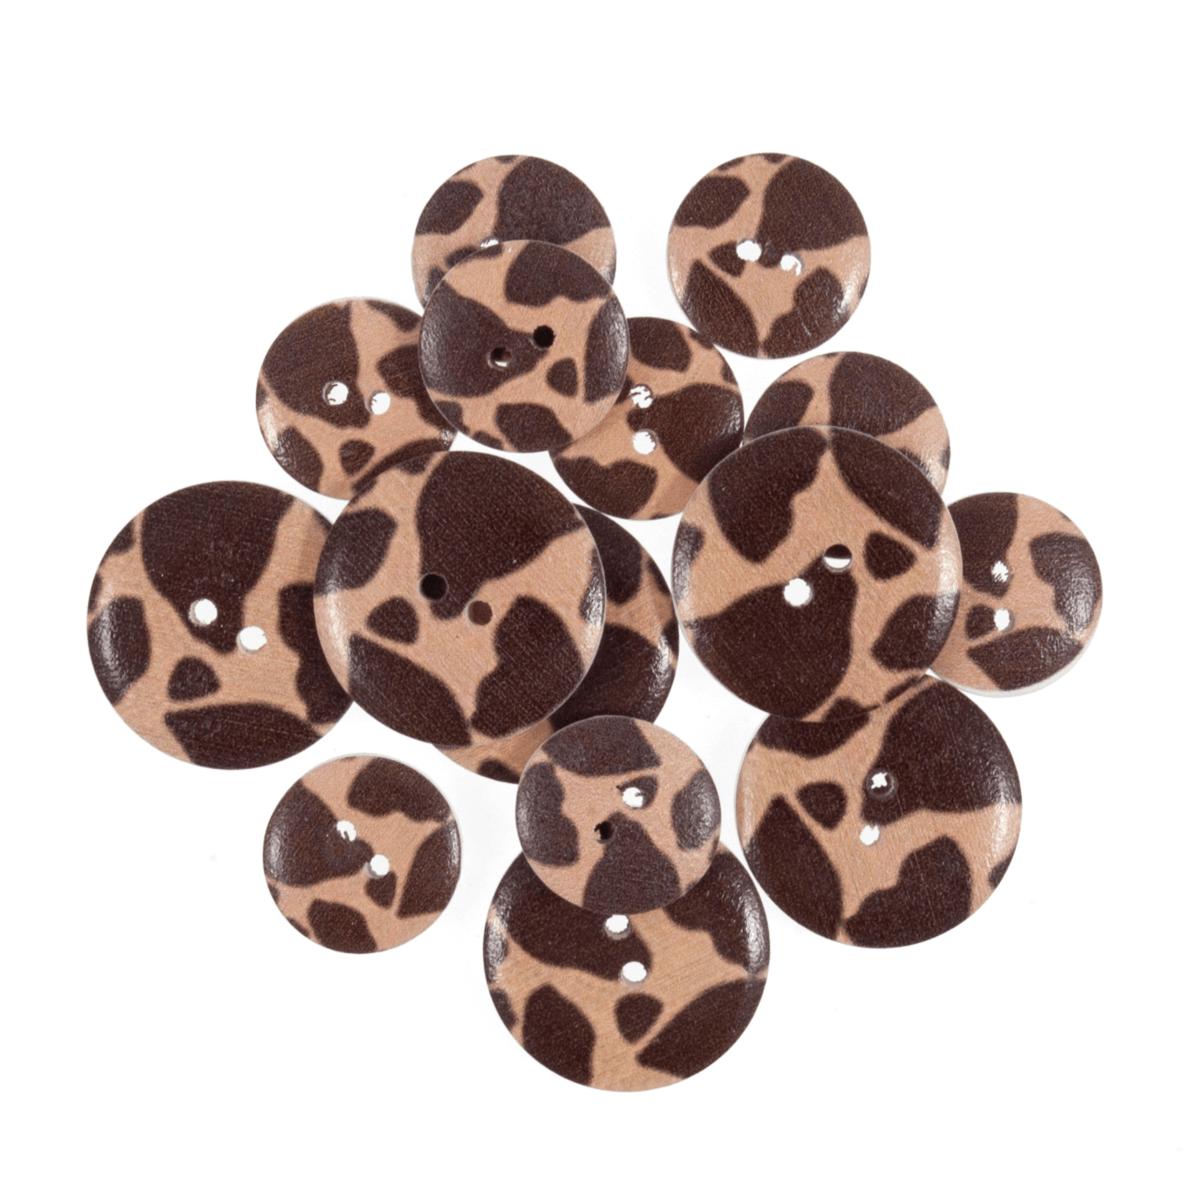 15 x Assorted Large Giraffe Animal Print Wooden Craft Buttons 18mm - 25mm